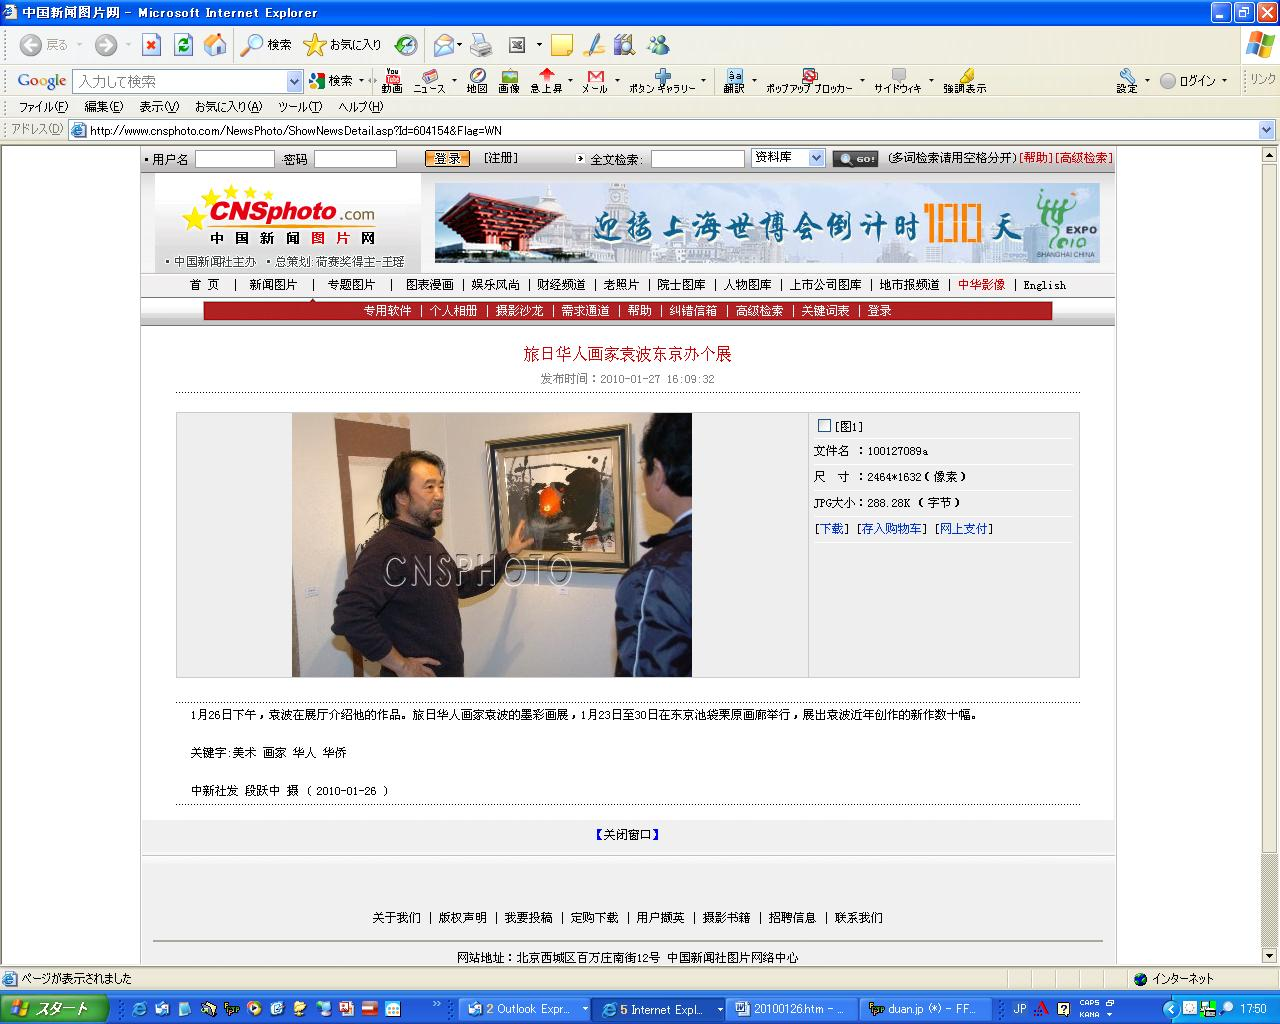 袁波墨彩画展写真一枚 中国新聞社より配信_d0027795_17525366.jpg